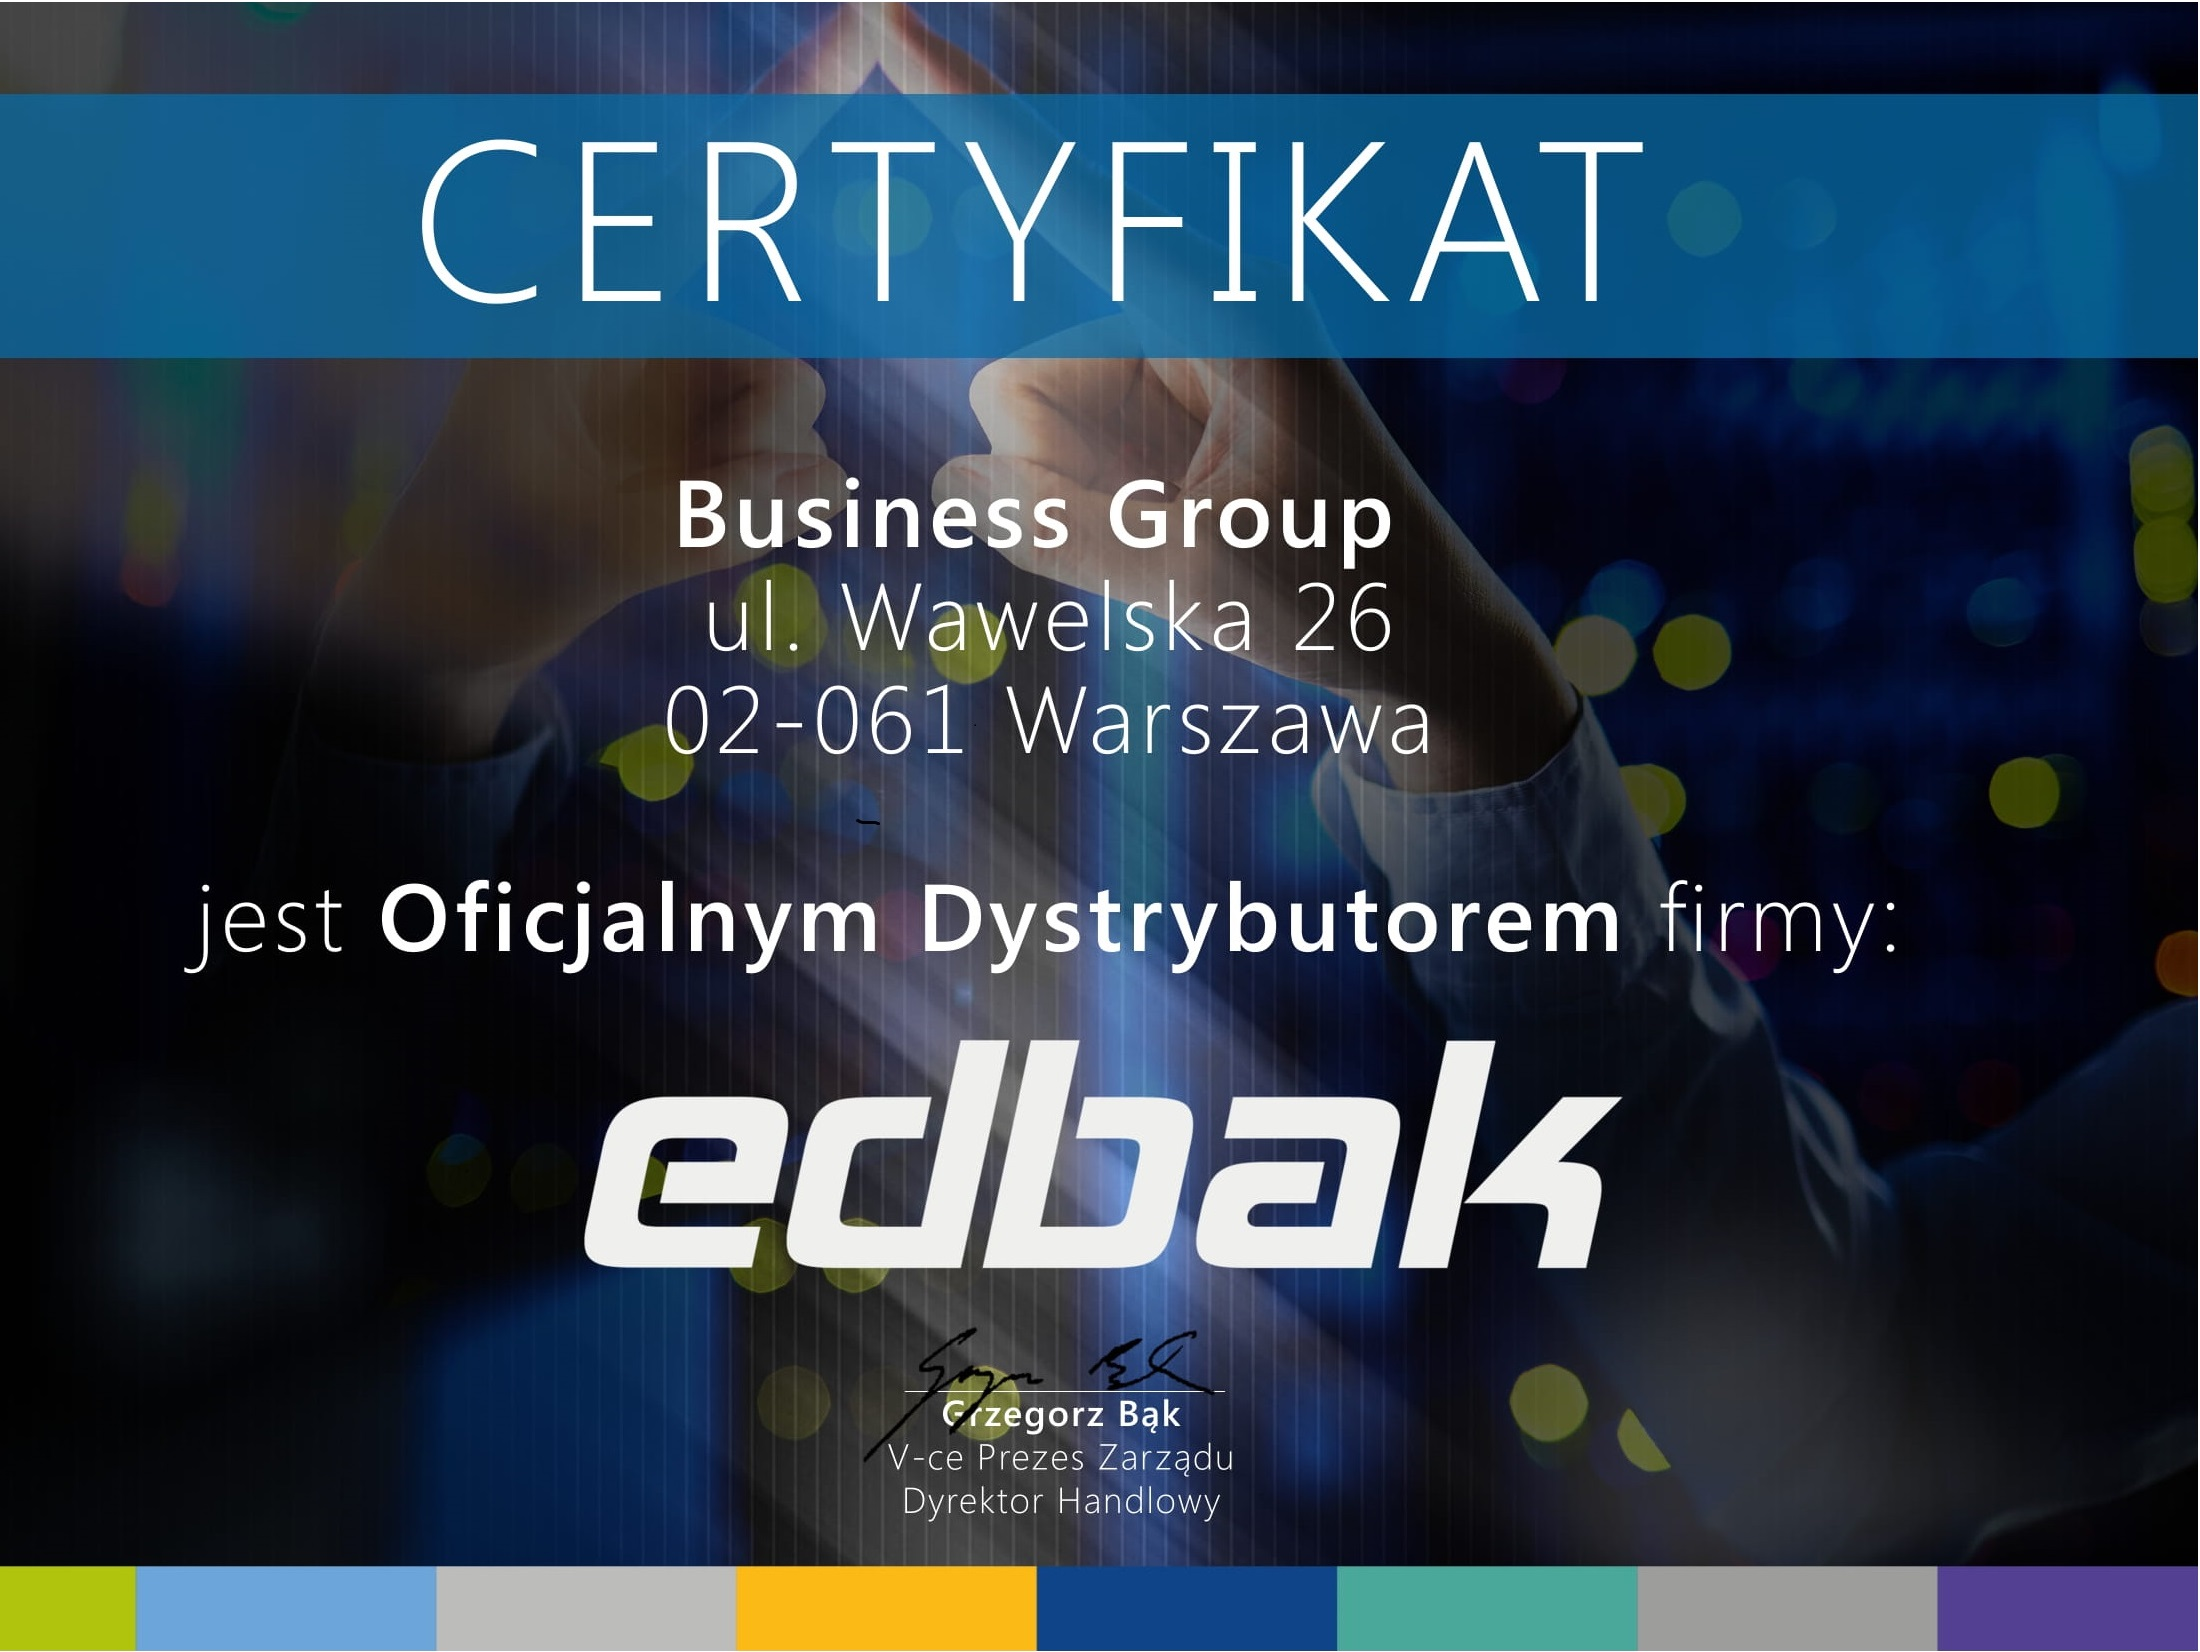 Certyfikat Edbak